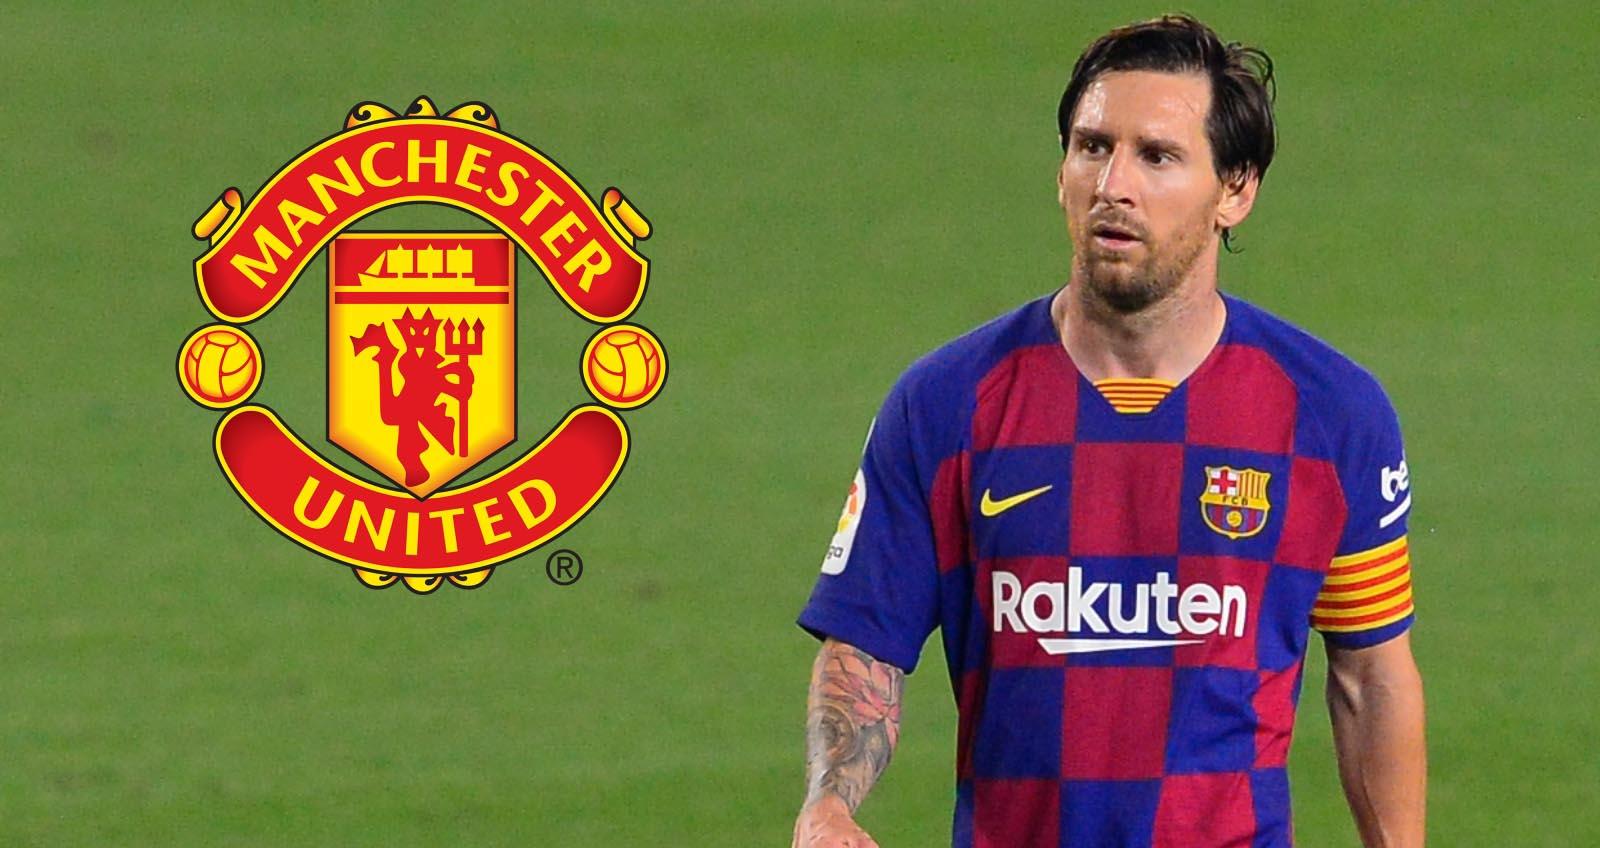 MU, Chuyển nhượng MU, MU chiêu mộ Messi, Messi chia tay Barcelona, Messi, Barca, Messi gia nhập MU, chuyển nhượng Barcelona, Barca, MU mua Messi, Messi rời Barcelona